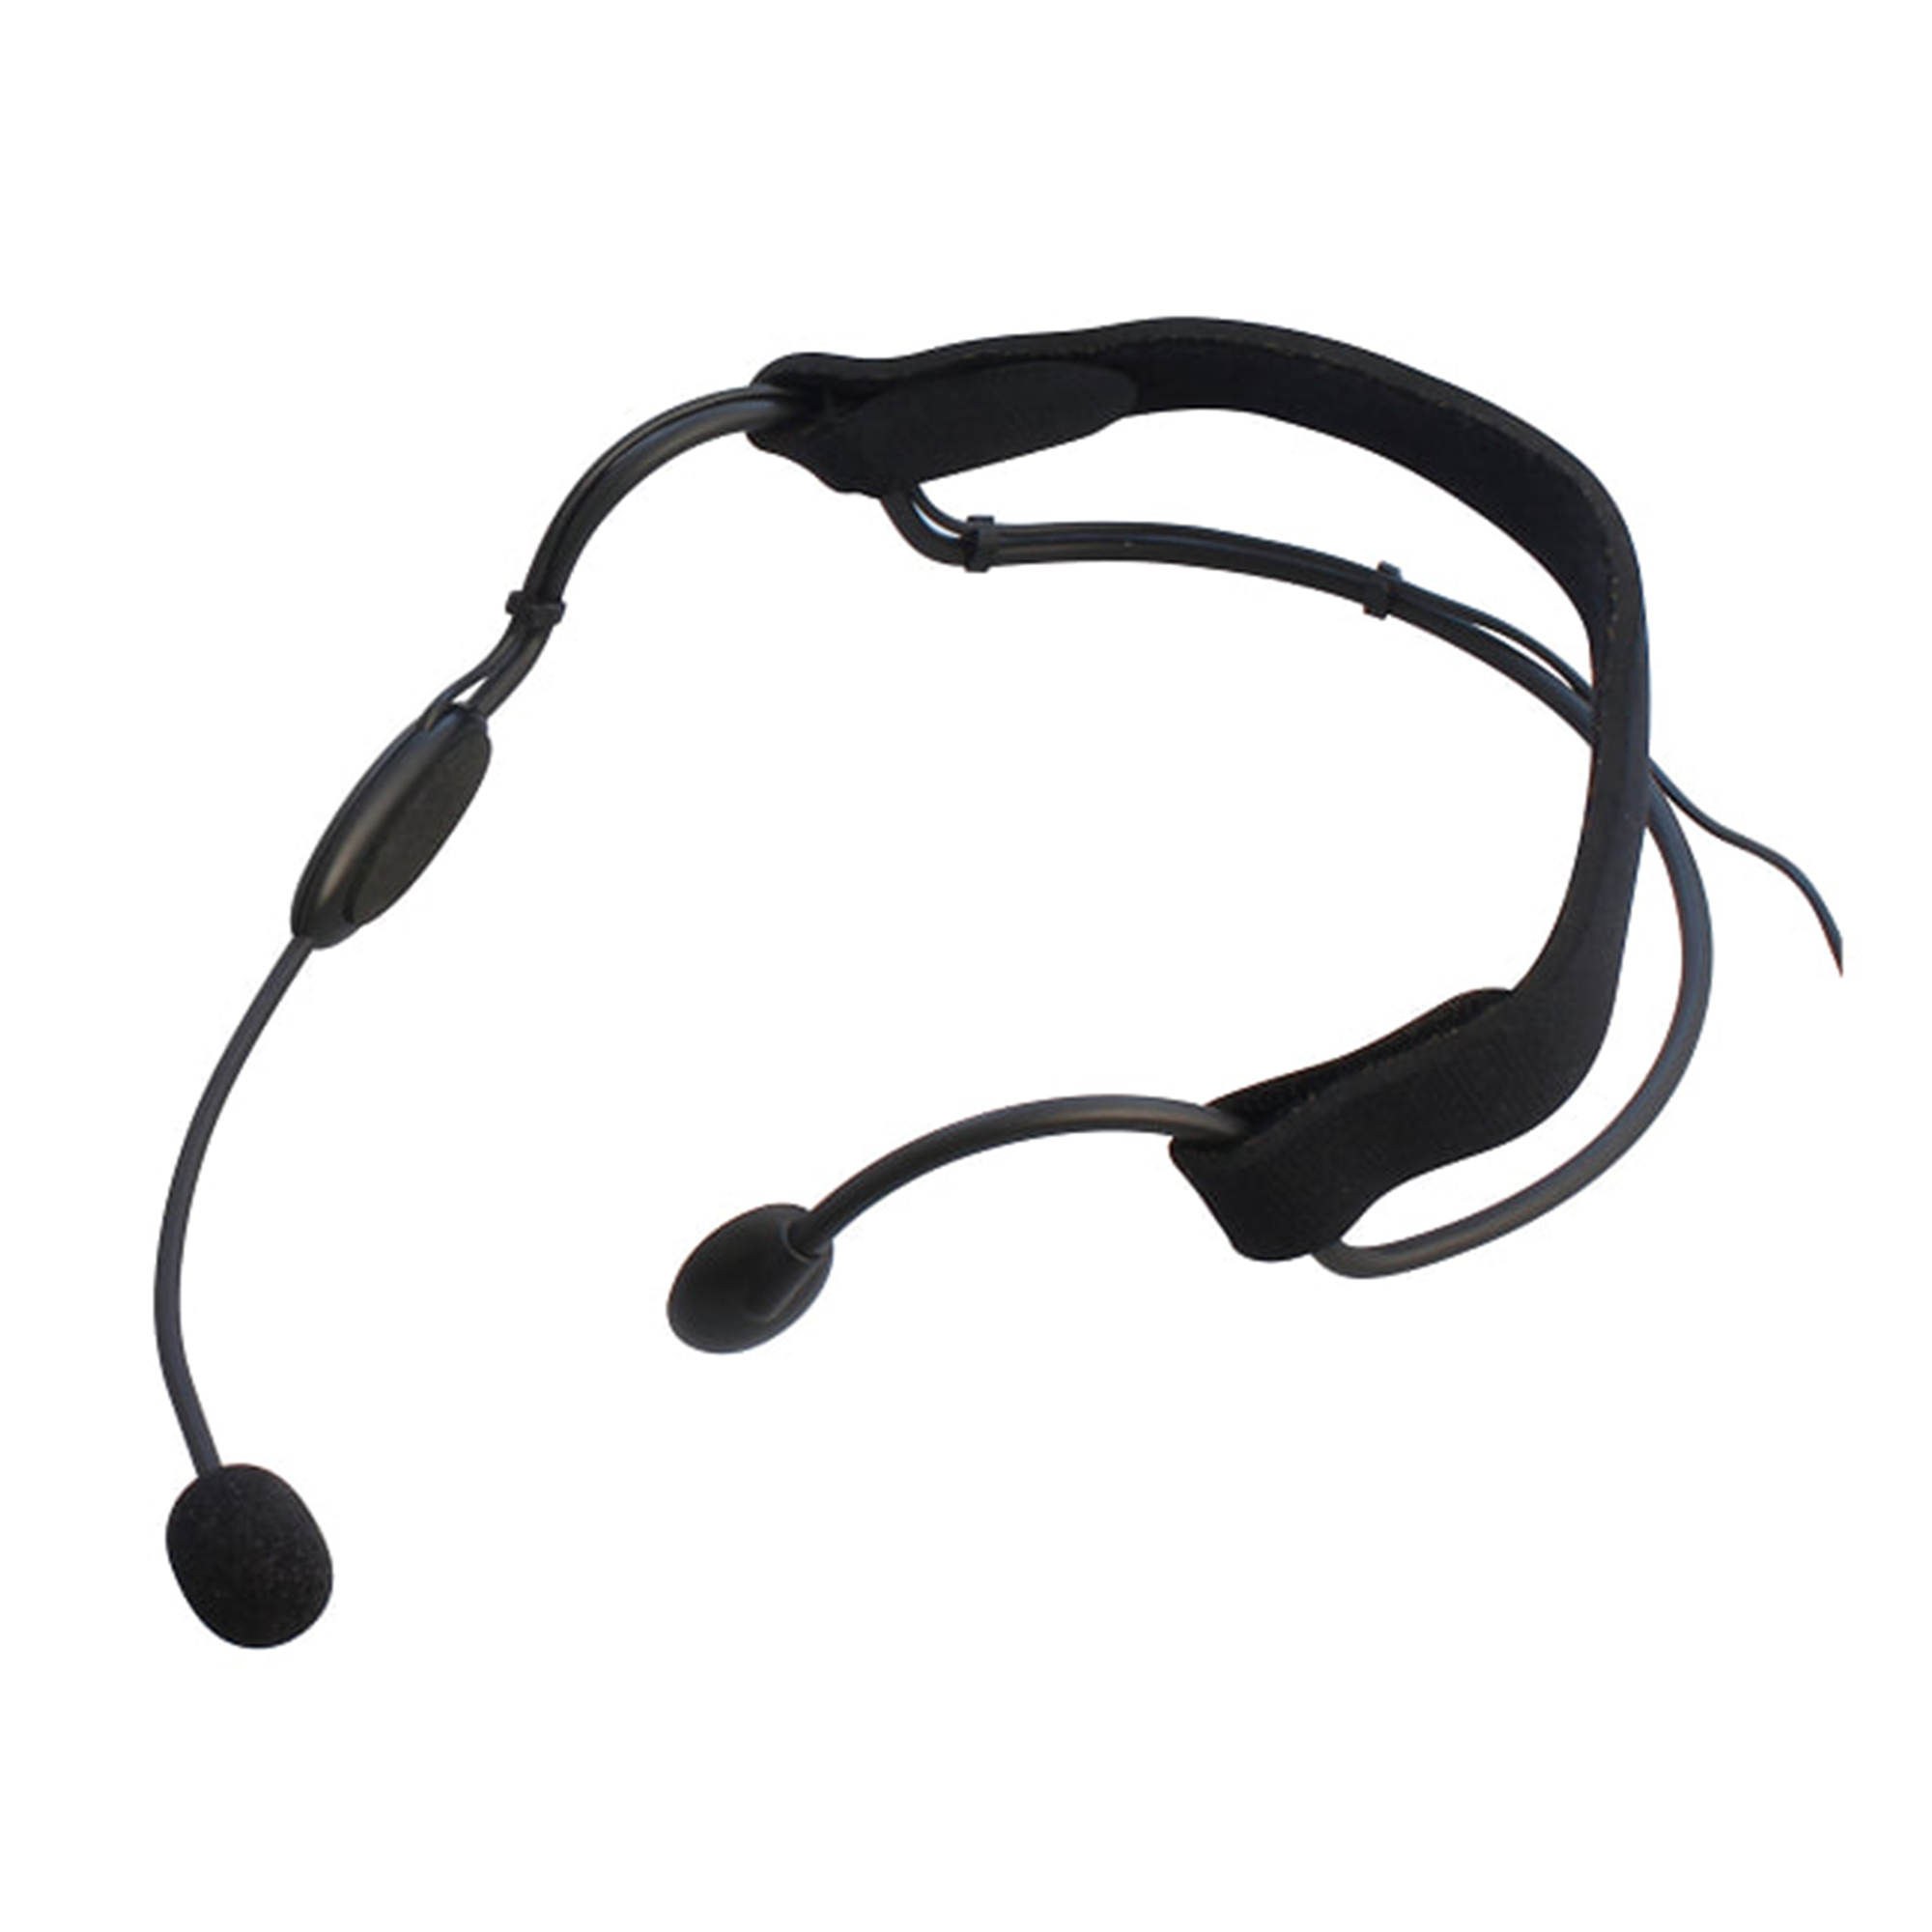 HM-35A Headsetmikrofon